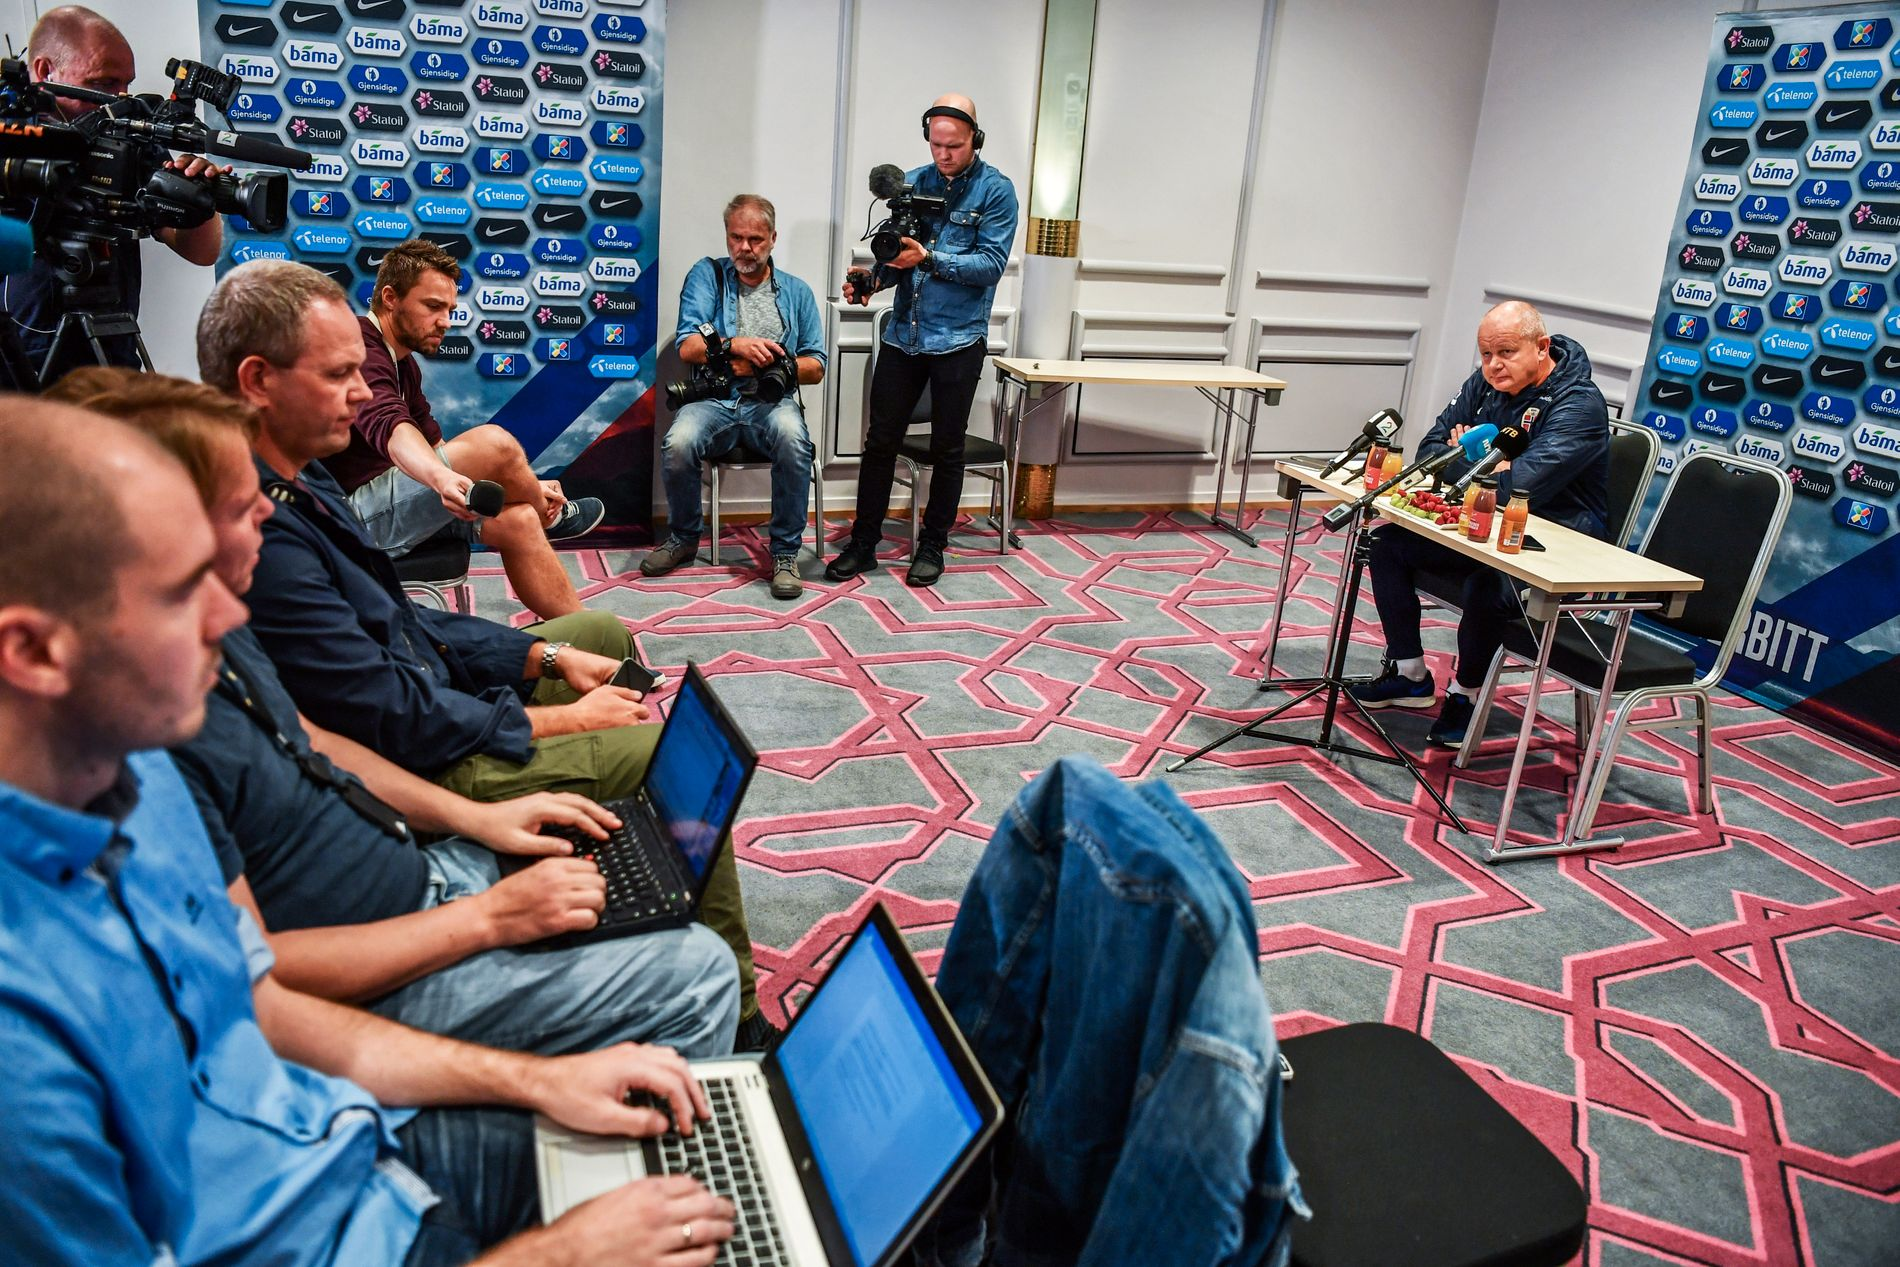 Per-Mathias Høgmo pressekonferanse fotballandslaget før VM-kvaliken mot Tyskland. Foto: BJØRN S. DELEBEKK, VG